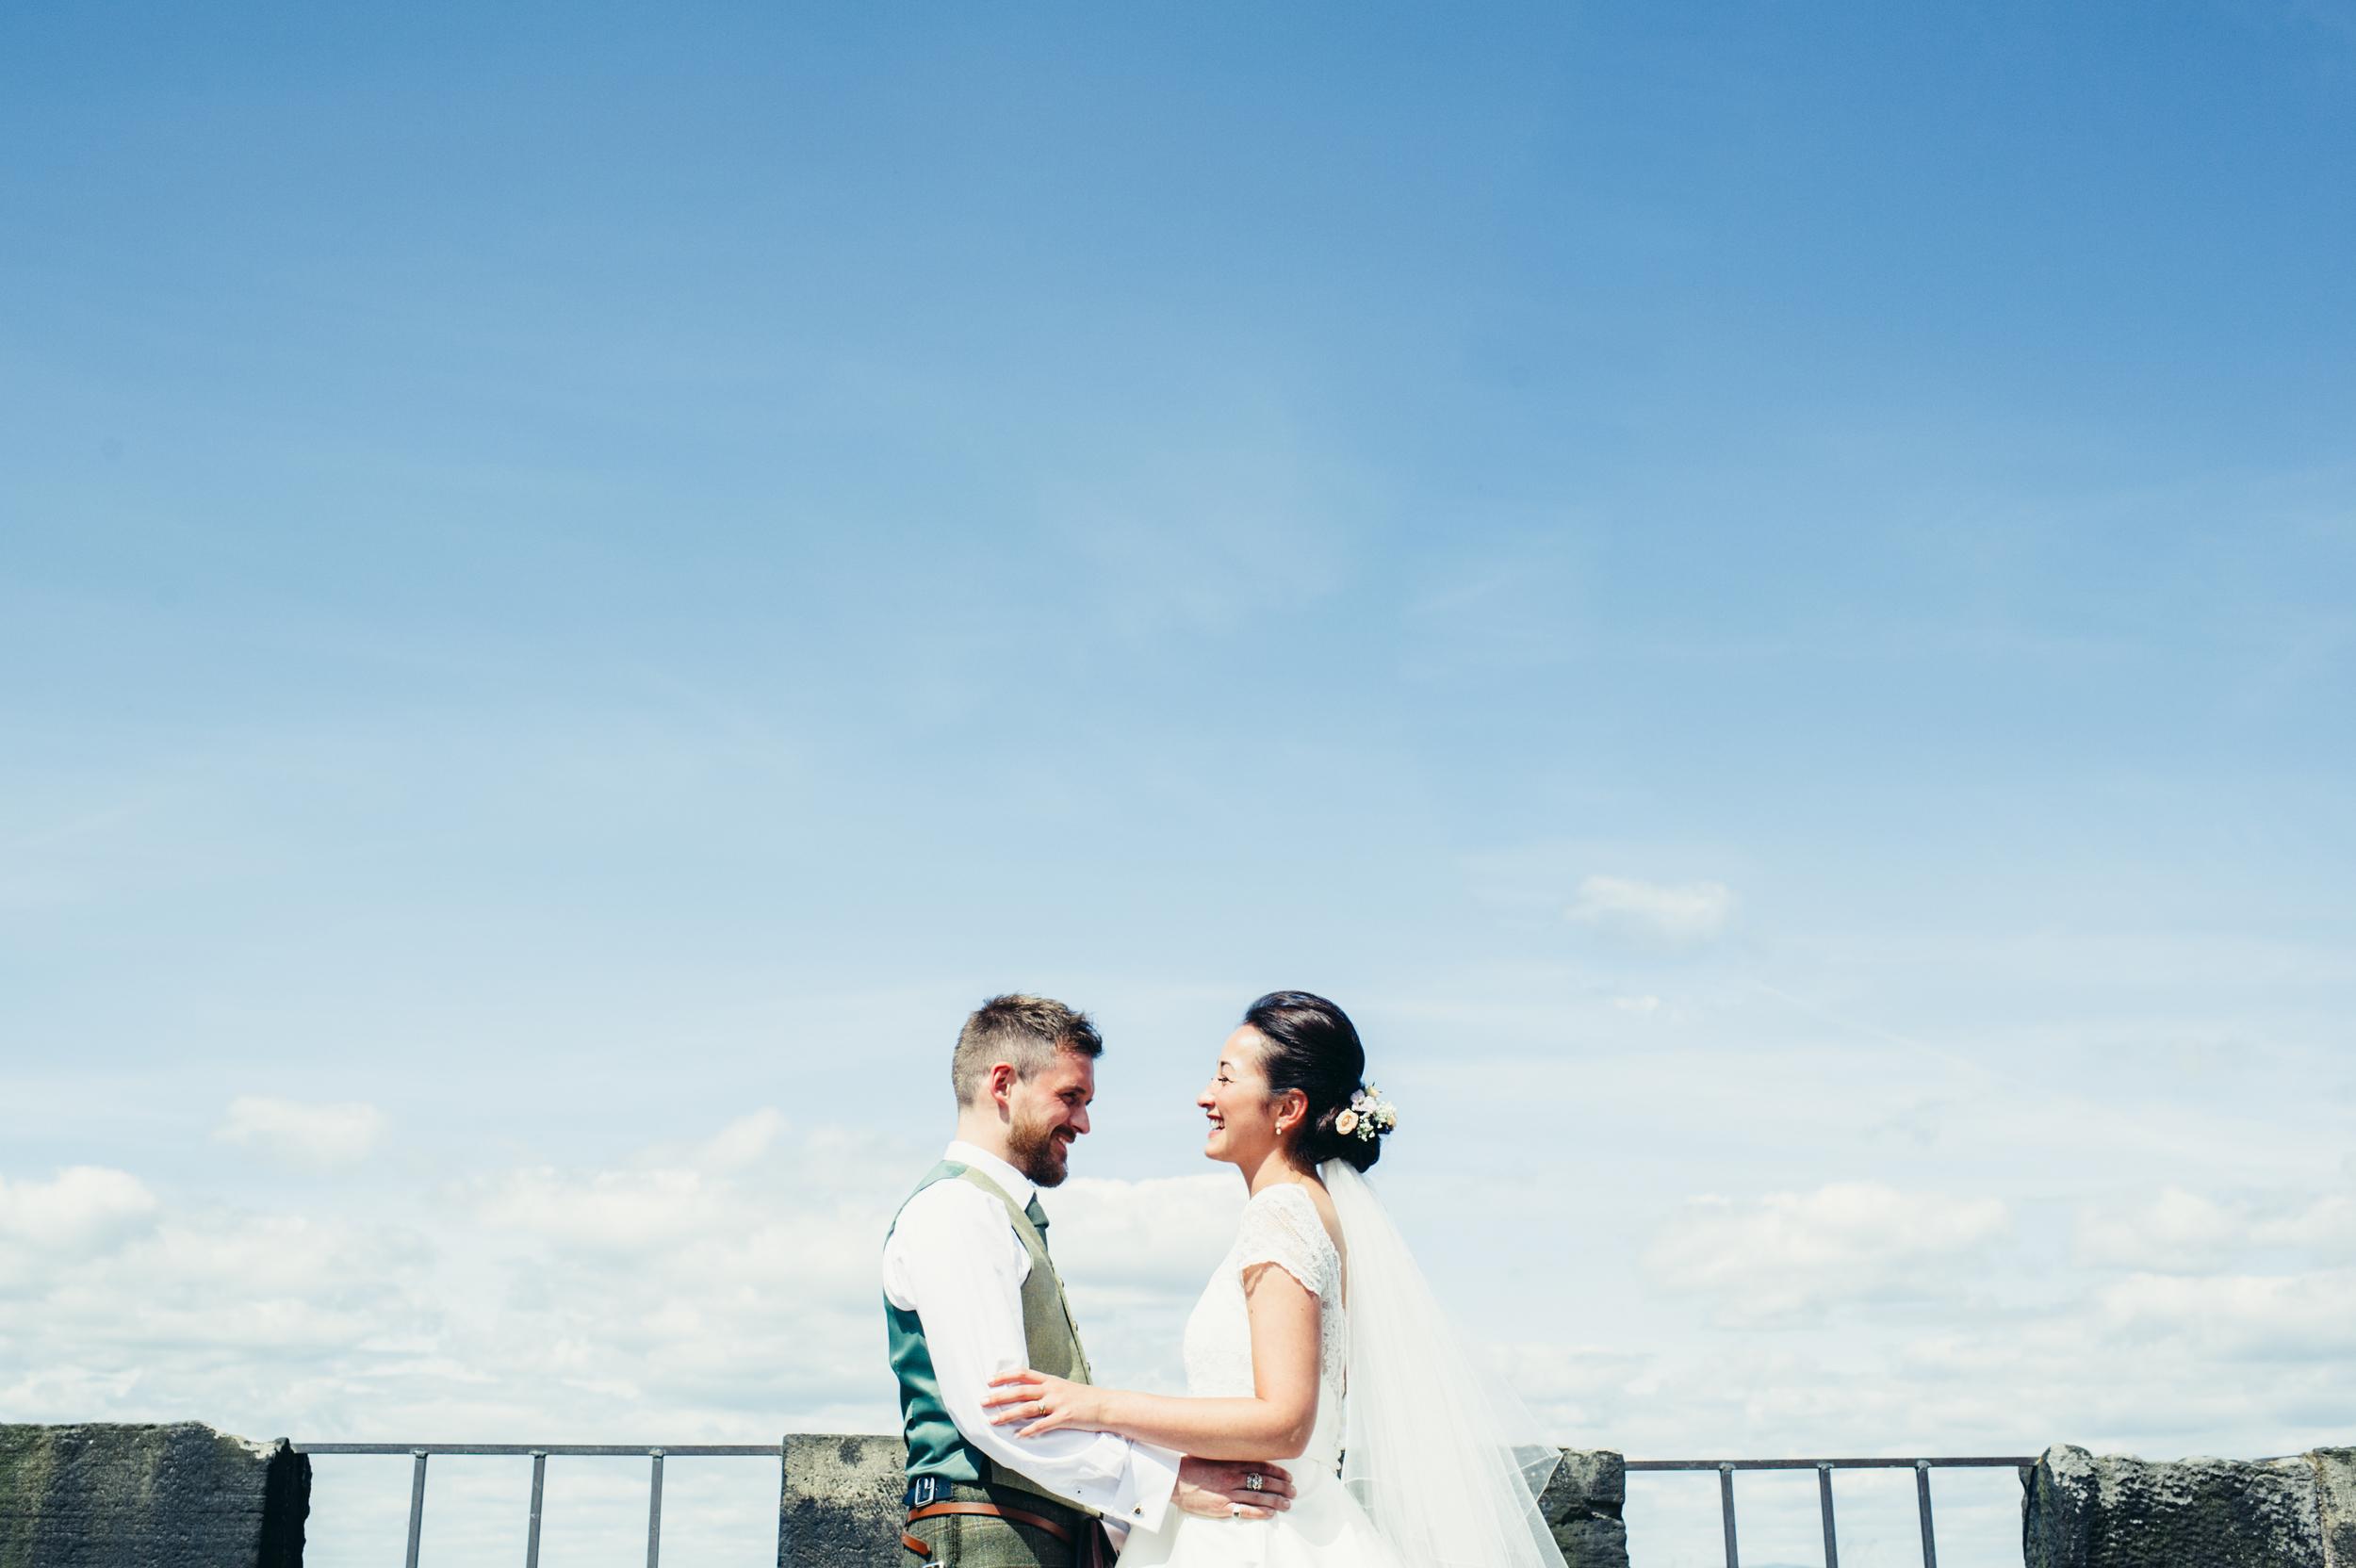 0111-lisa-devine-alternative-creative-wedding-photography-glasgow-edinburgh.JPG